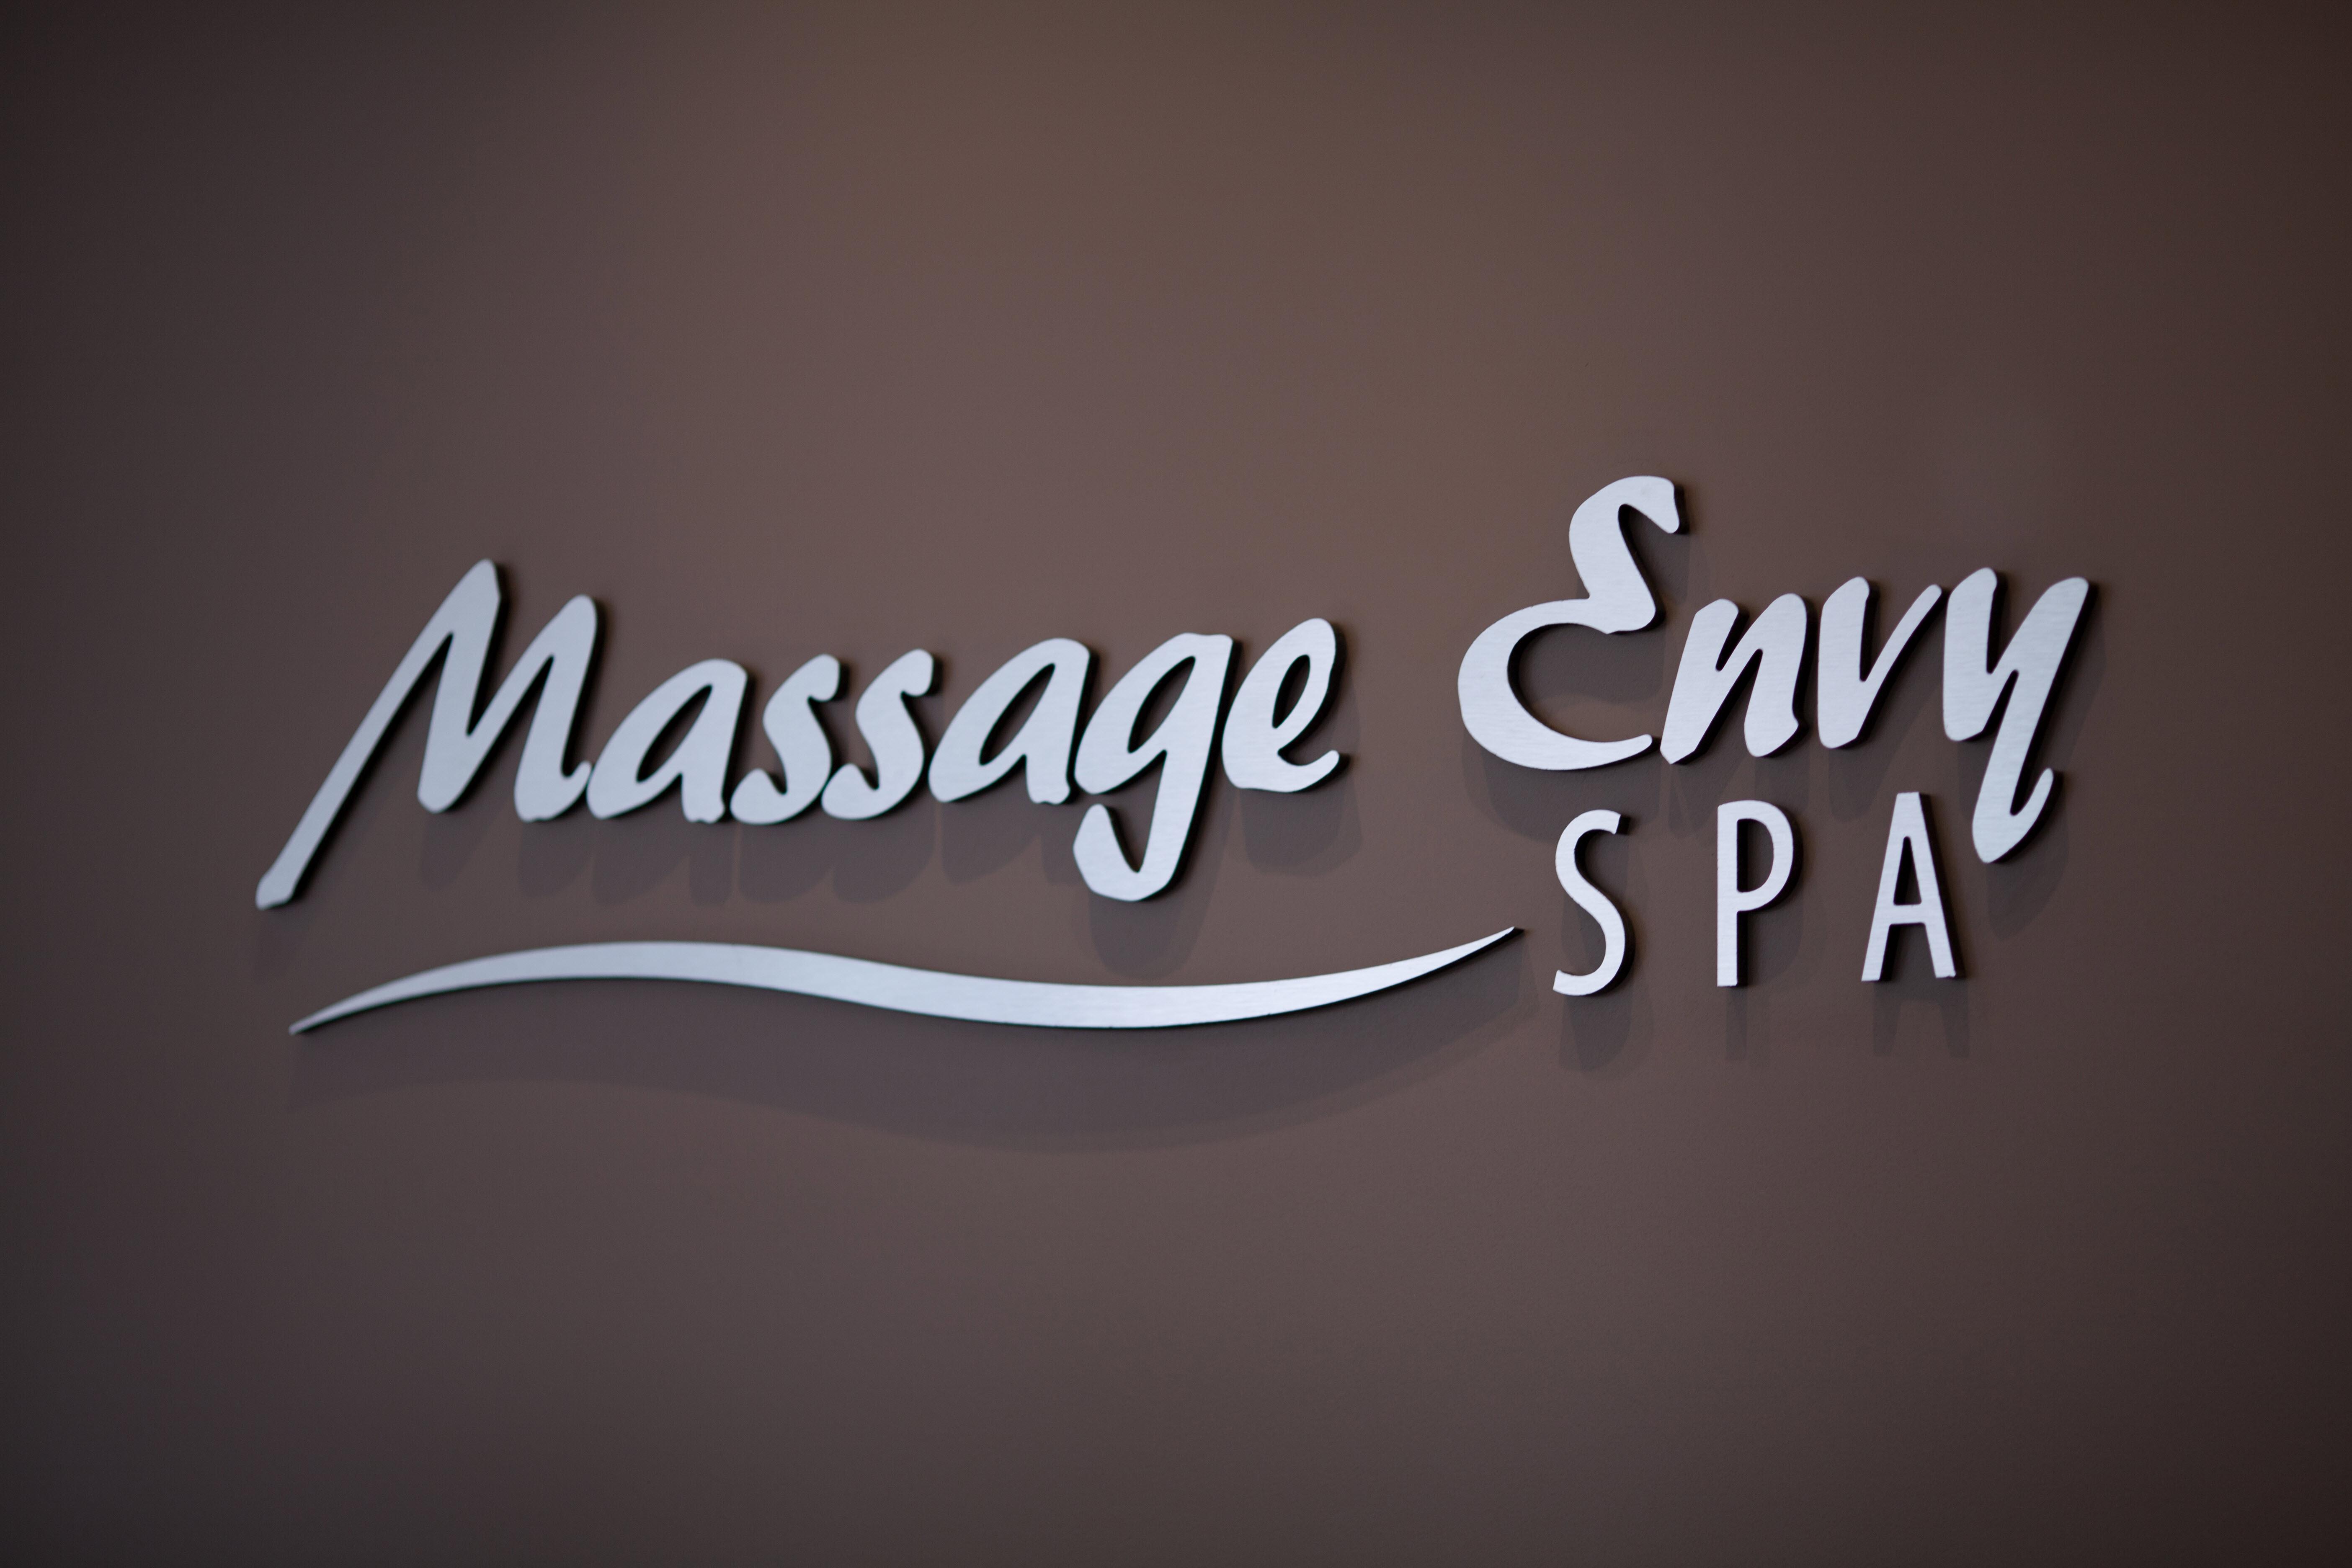 Massage Envy Spa - Sausalito